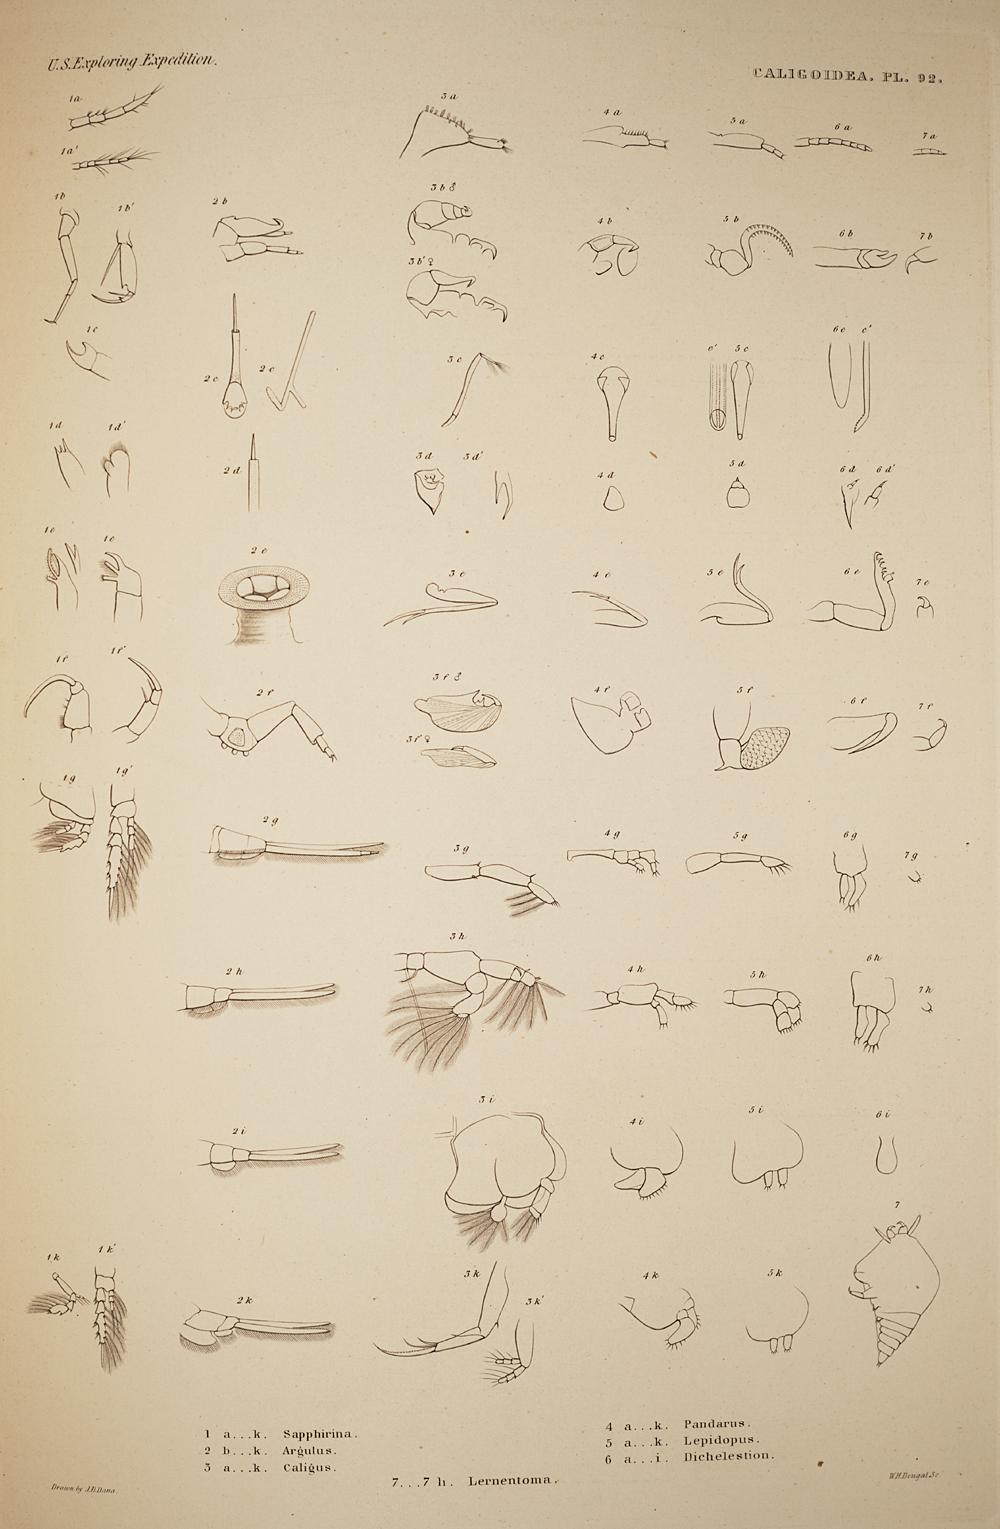 Caligoidea. Pl. 92,  Image number:SIL19-21-217b